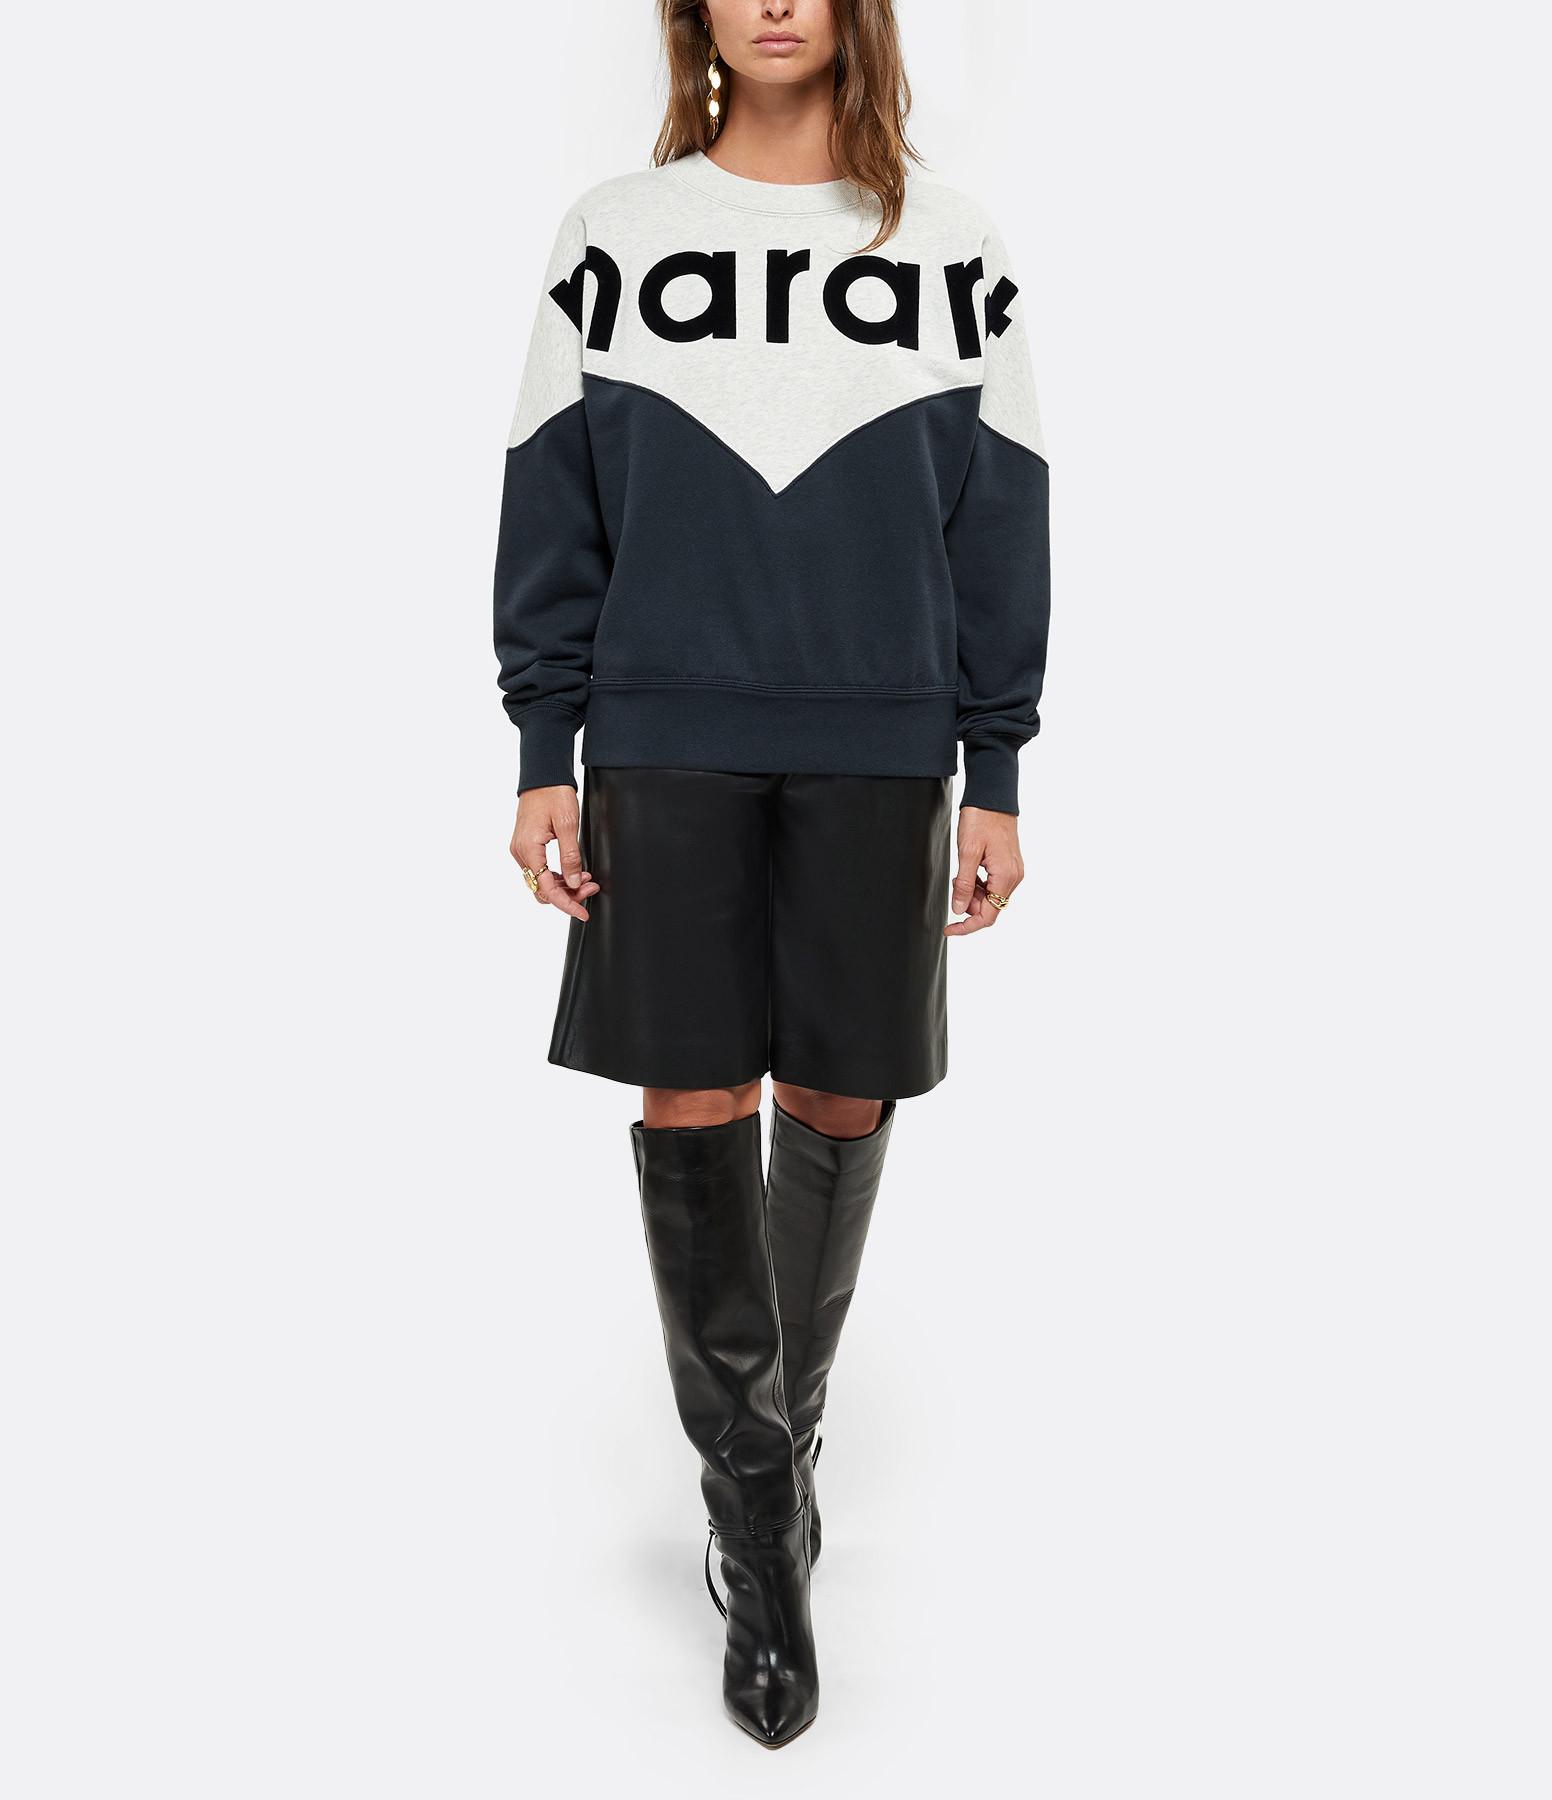 ISABEL MARANT ÉTOILE - Sweatshirt Houston Coton Noir